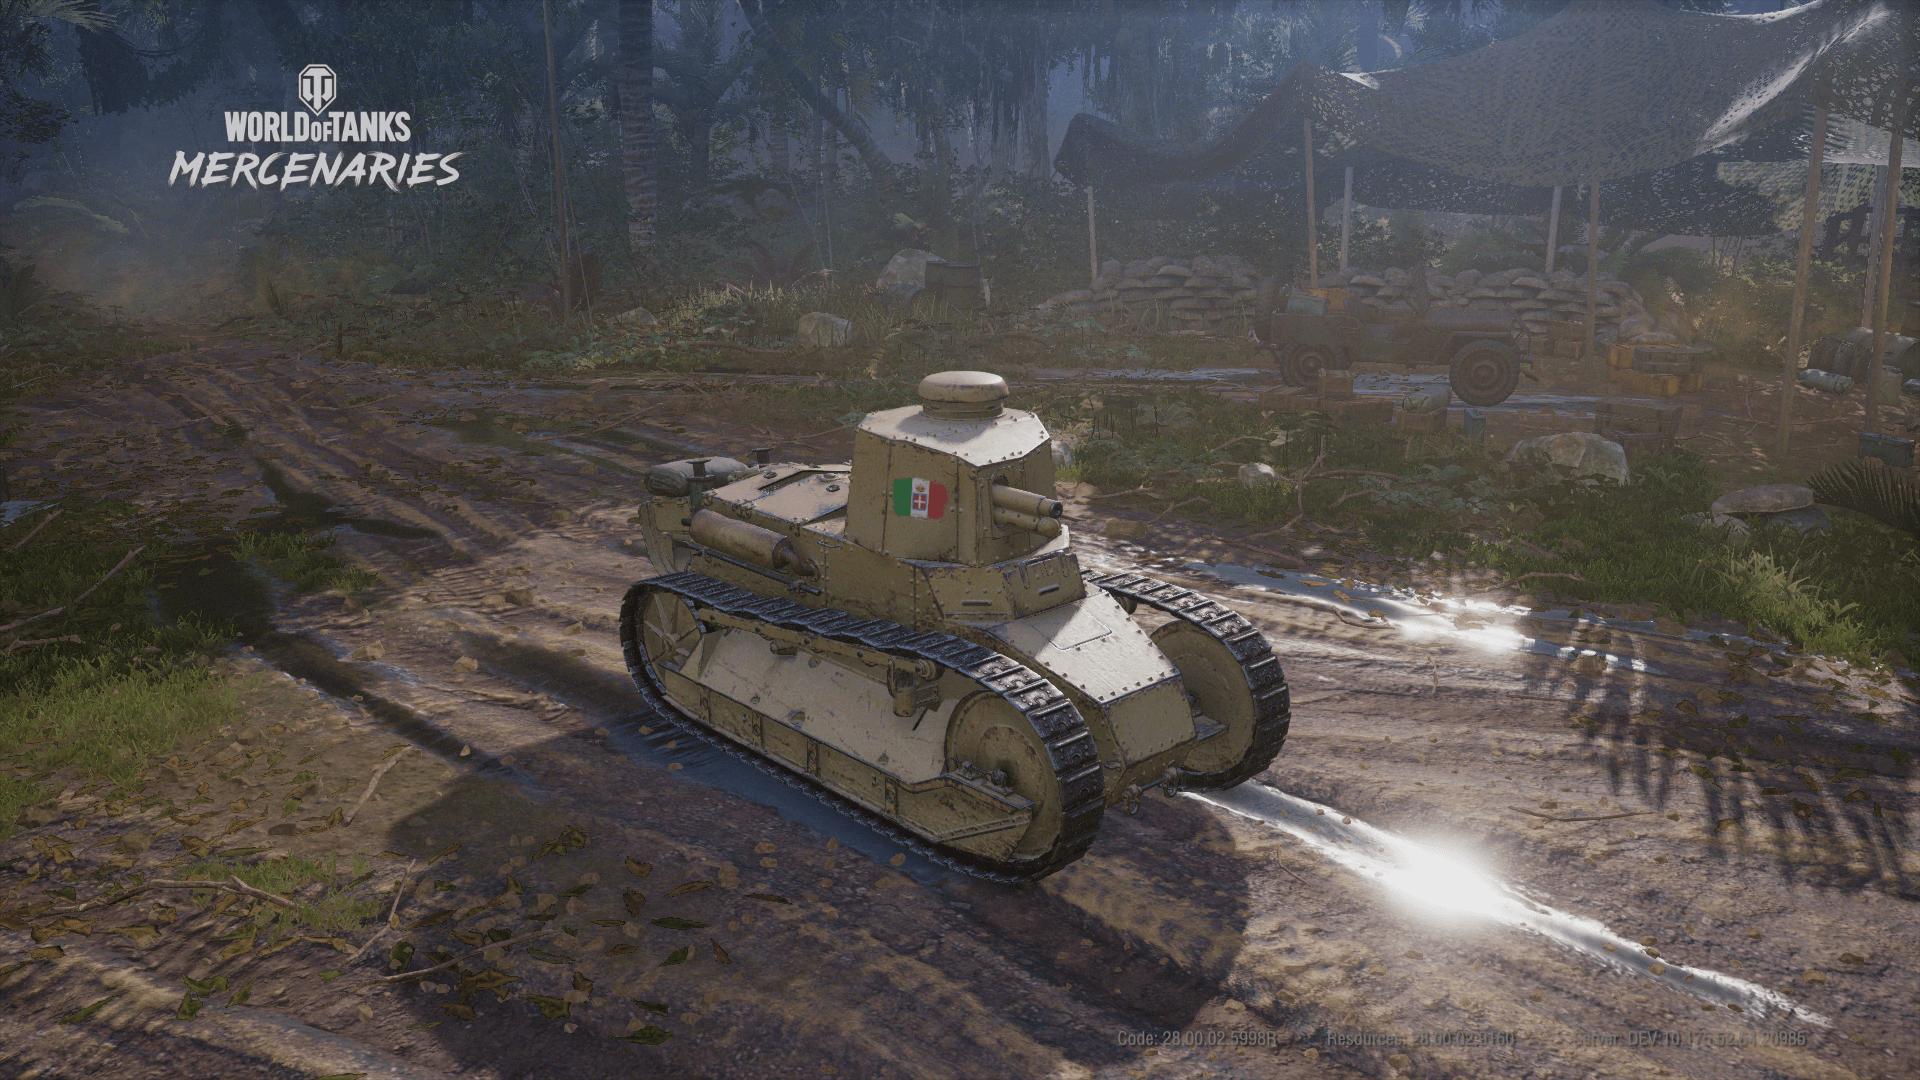 WoT Mercenaries: Italian Tree + Pictures – The Armored Patrol